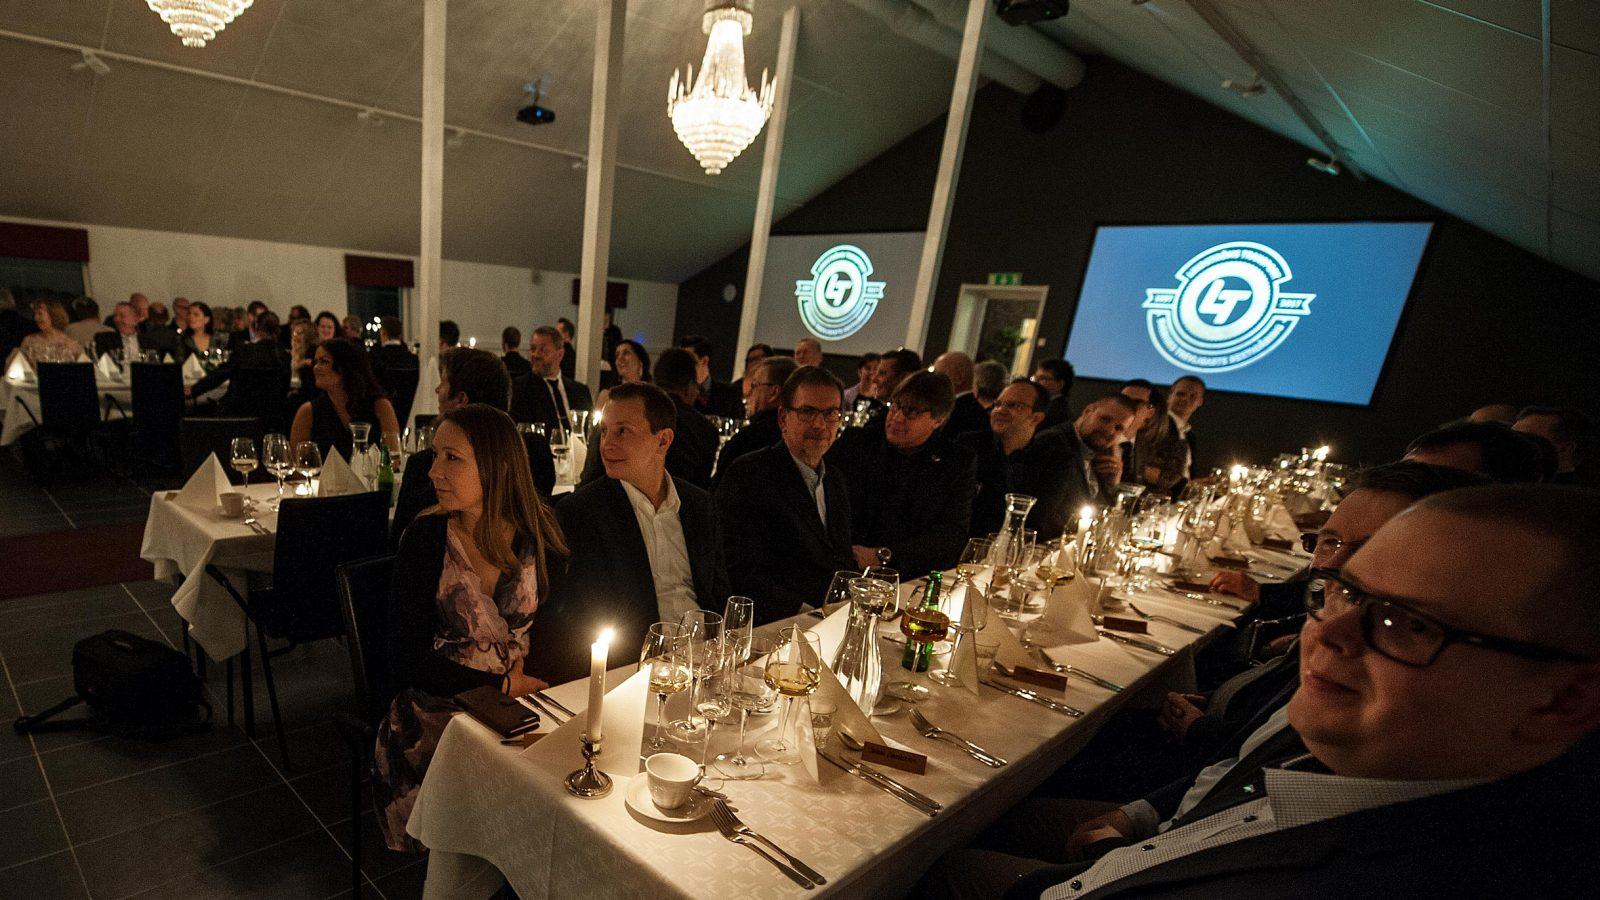 Gäster sittandes vid bord